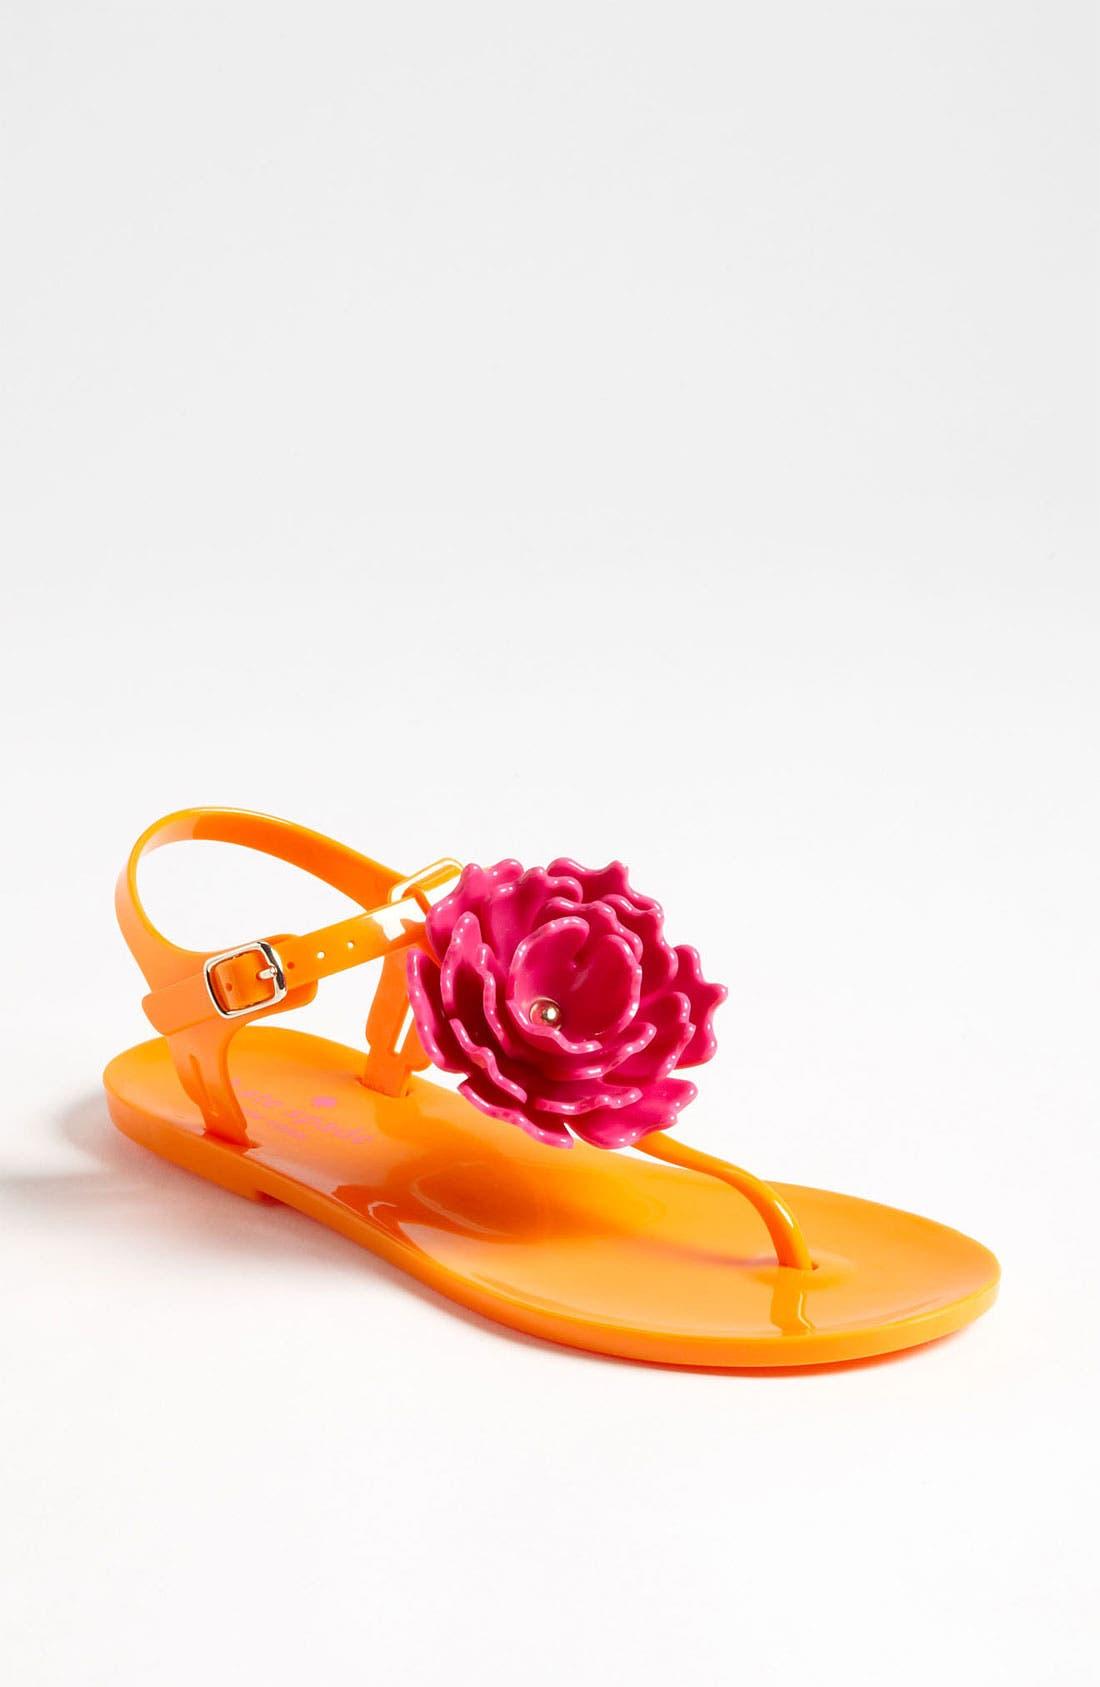 Alternate Image 1 Selected - kate spade new york 'fiala' sandal